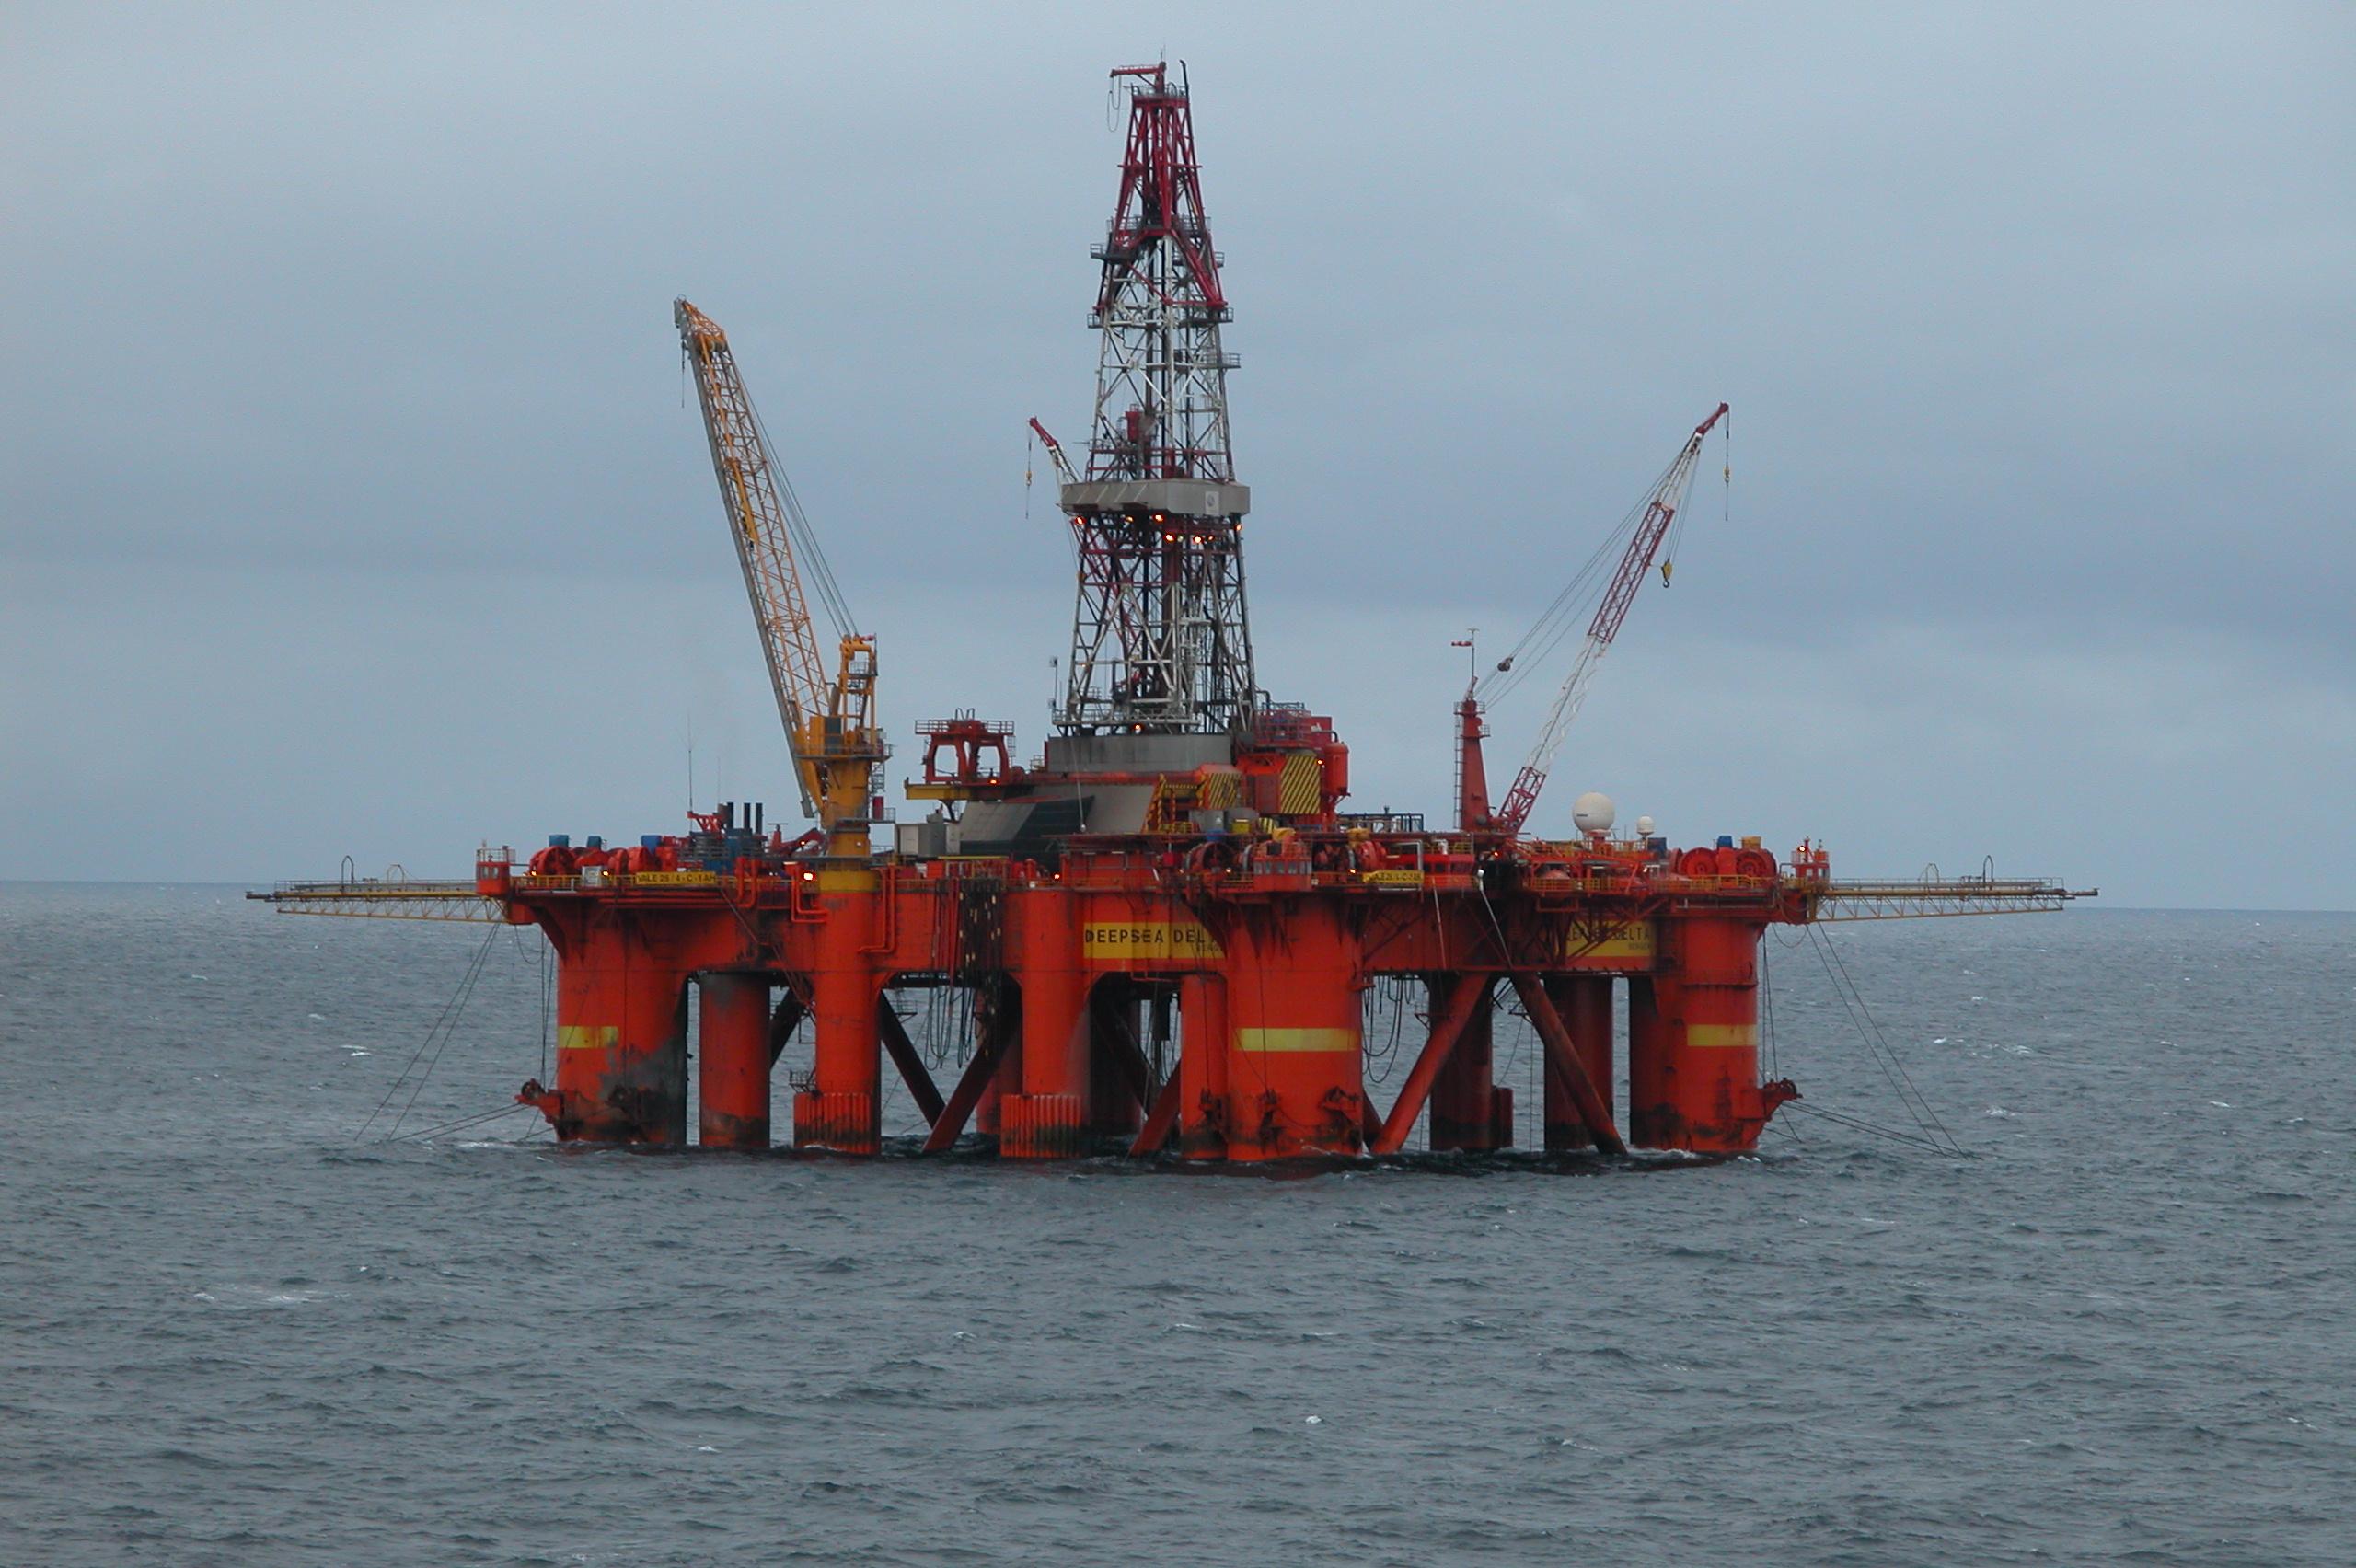 20060418140046%21Oil_platform_in_the_North_Sea.jpg